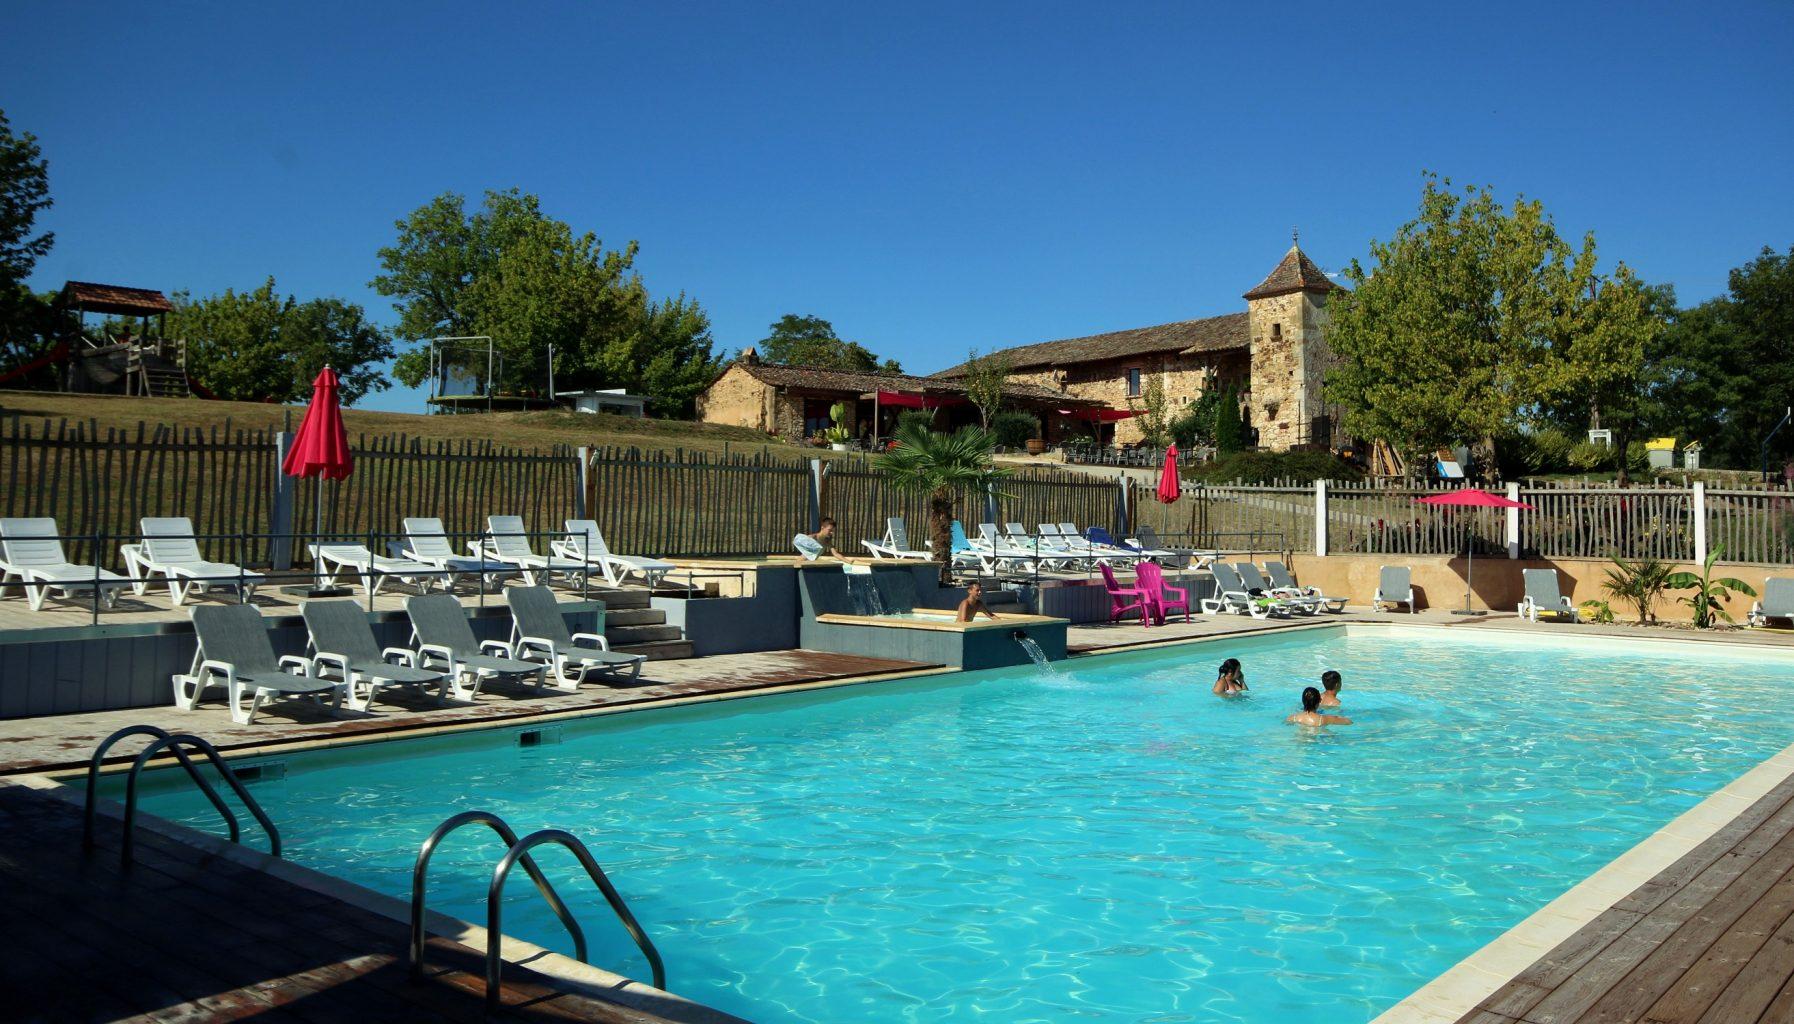 Camping dordogne parc aquatique piscine chauff e toboggans for Chauffer piscine pas cher